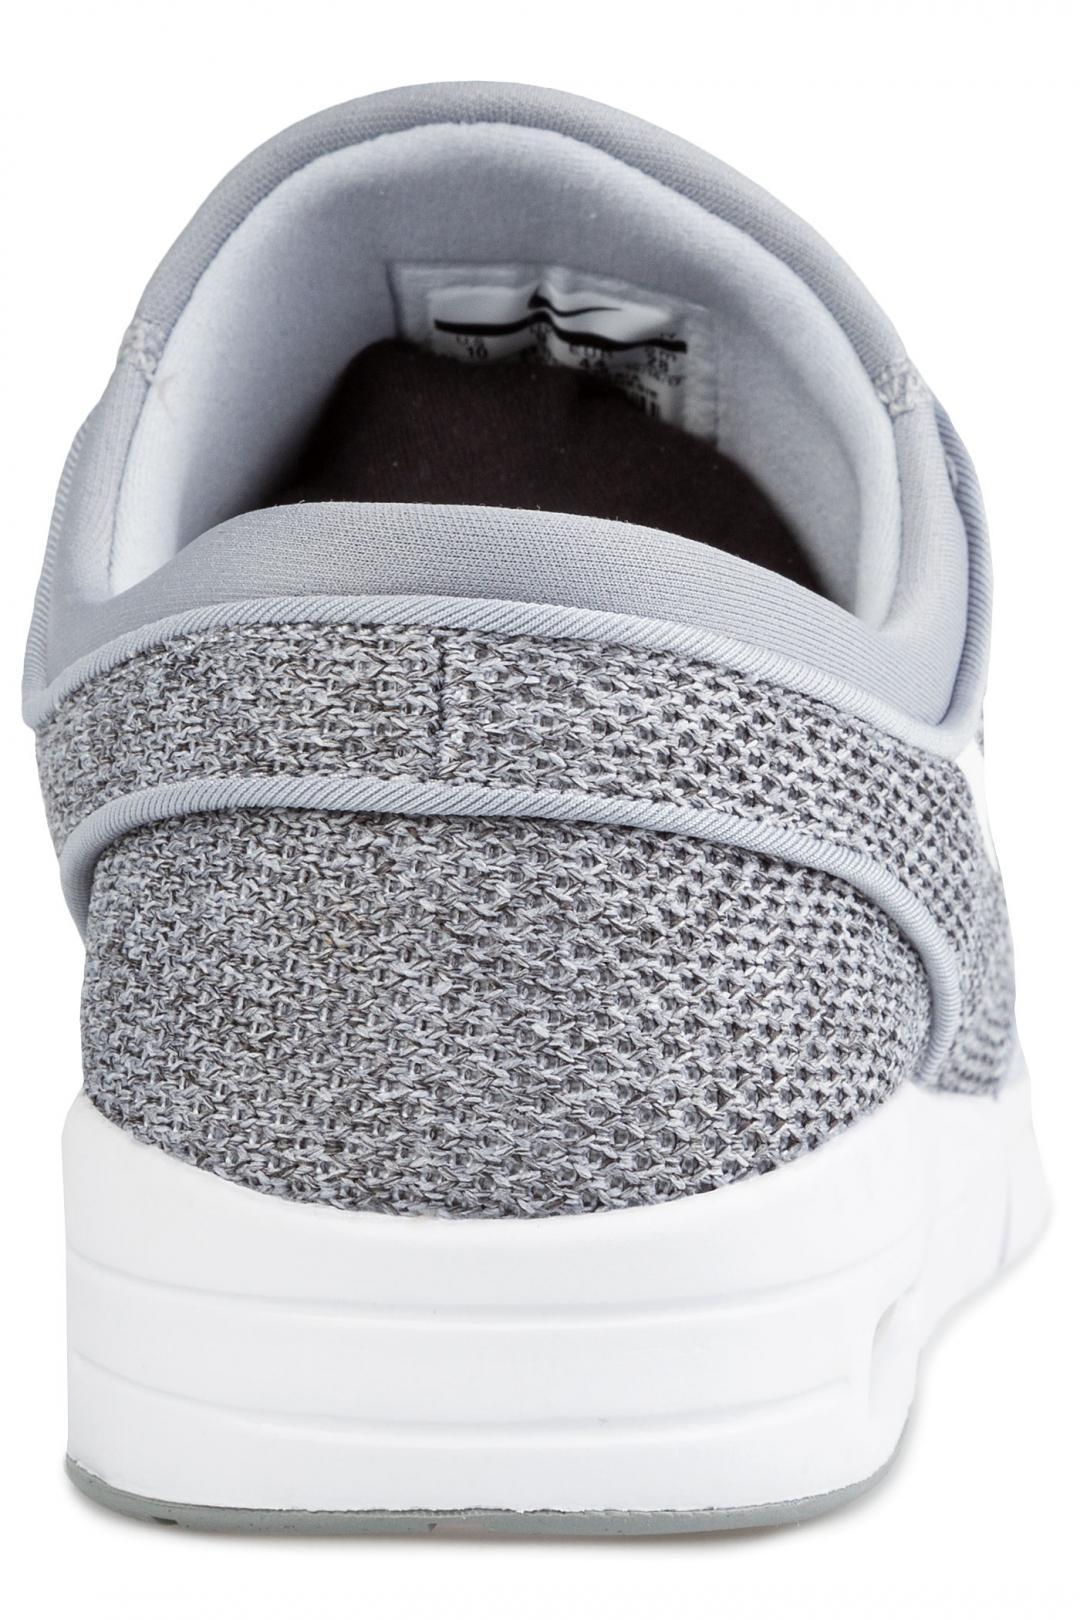 Uomo Nike SB Stefan Janoski Max wolf grey white | Sneakers low top